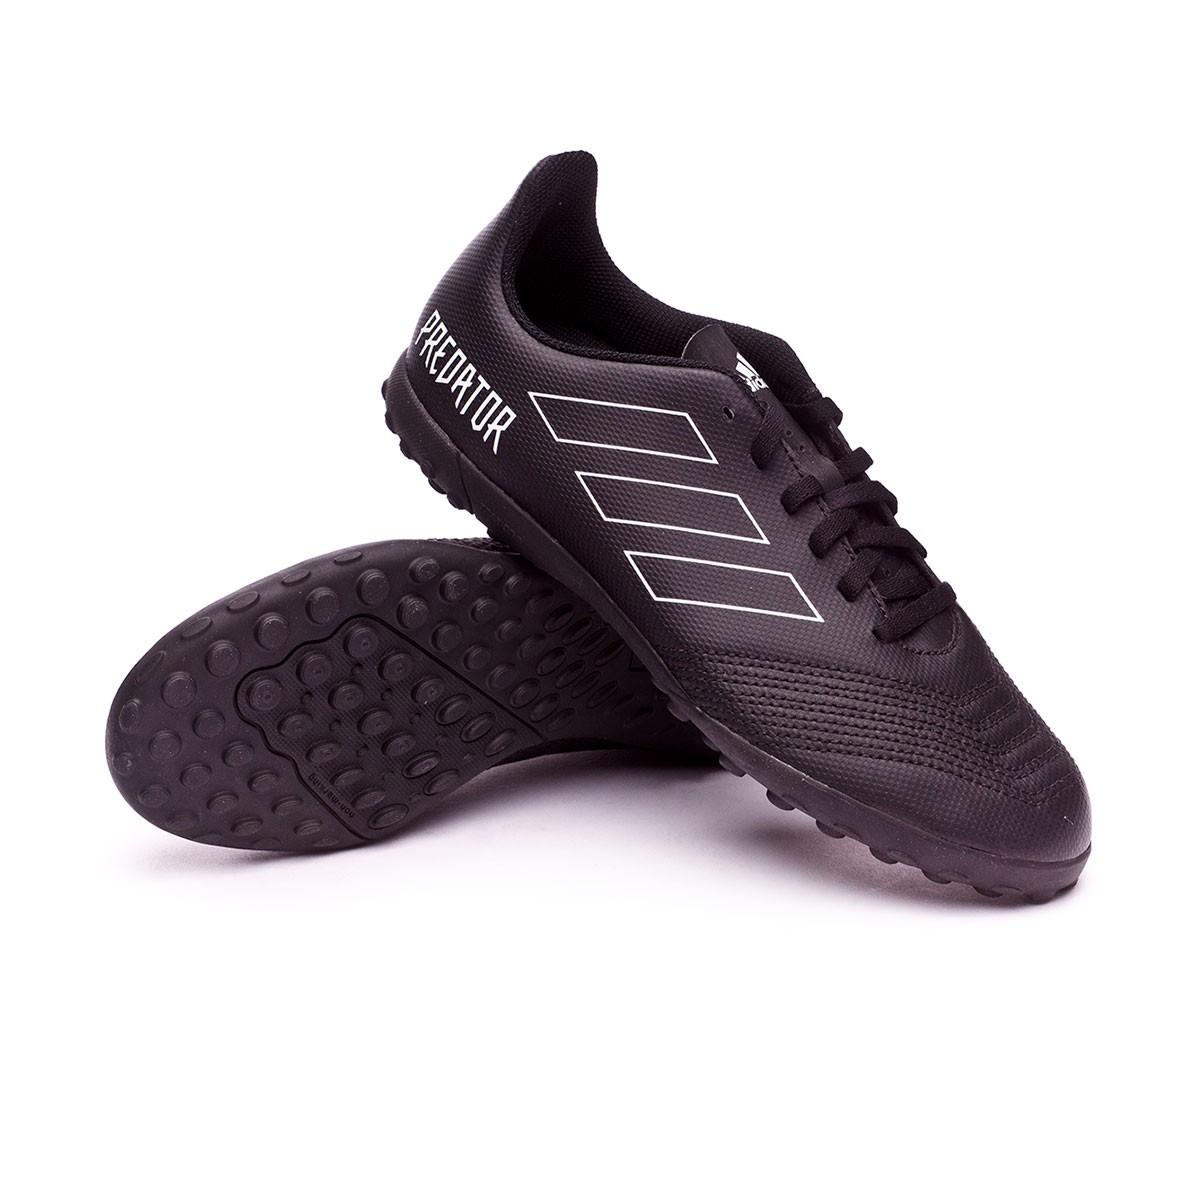 finest selection 4f221 7a303 adidas Kids Predator Tango 18.4 Football Boot